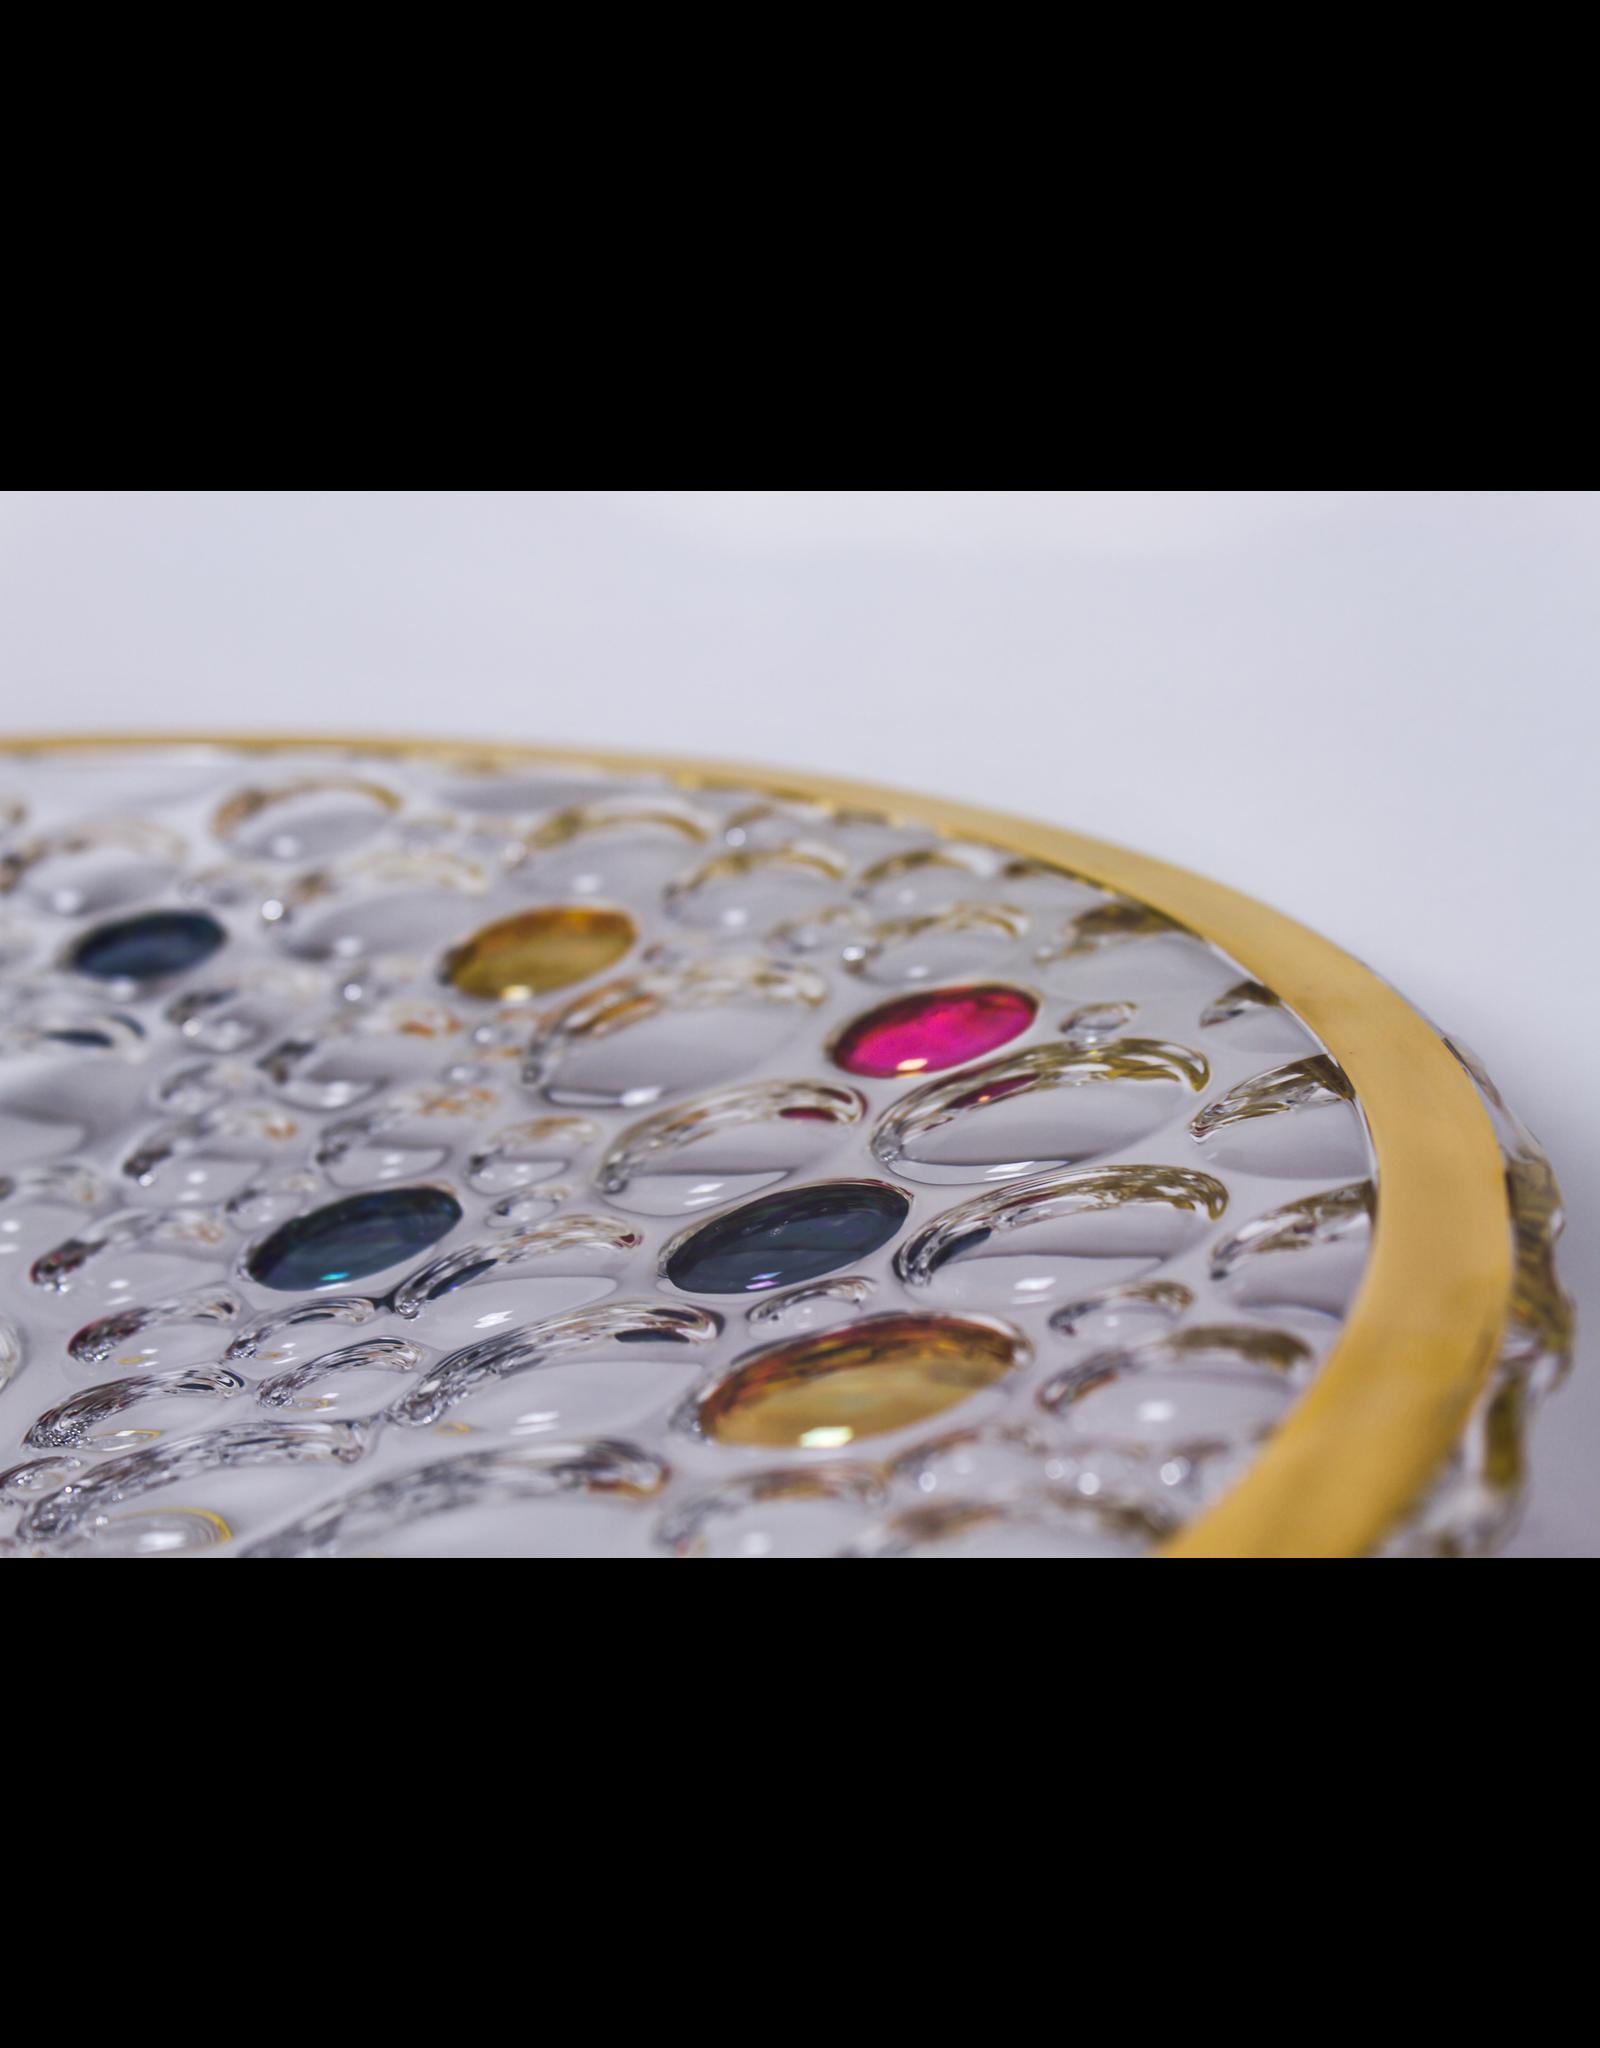 Skloglass Bolla kristal plateau op standaard / kleurrijk decoratie